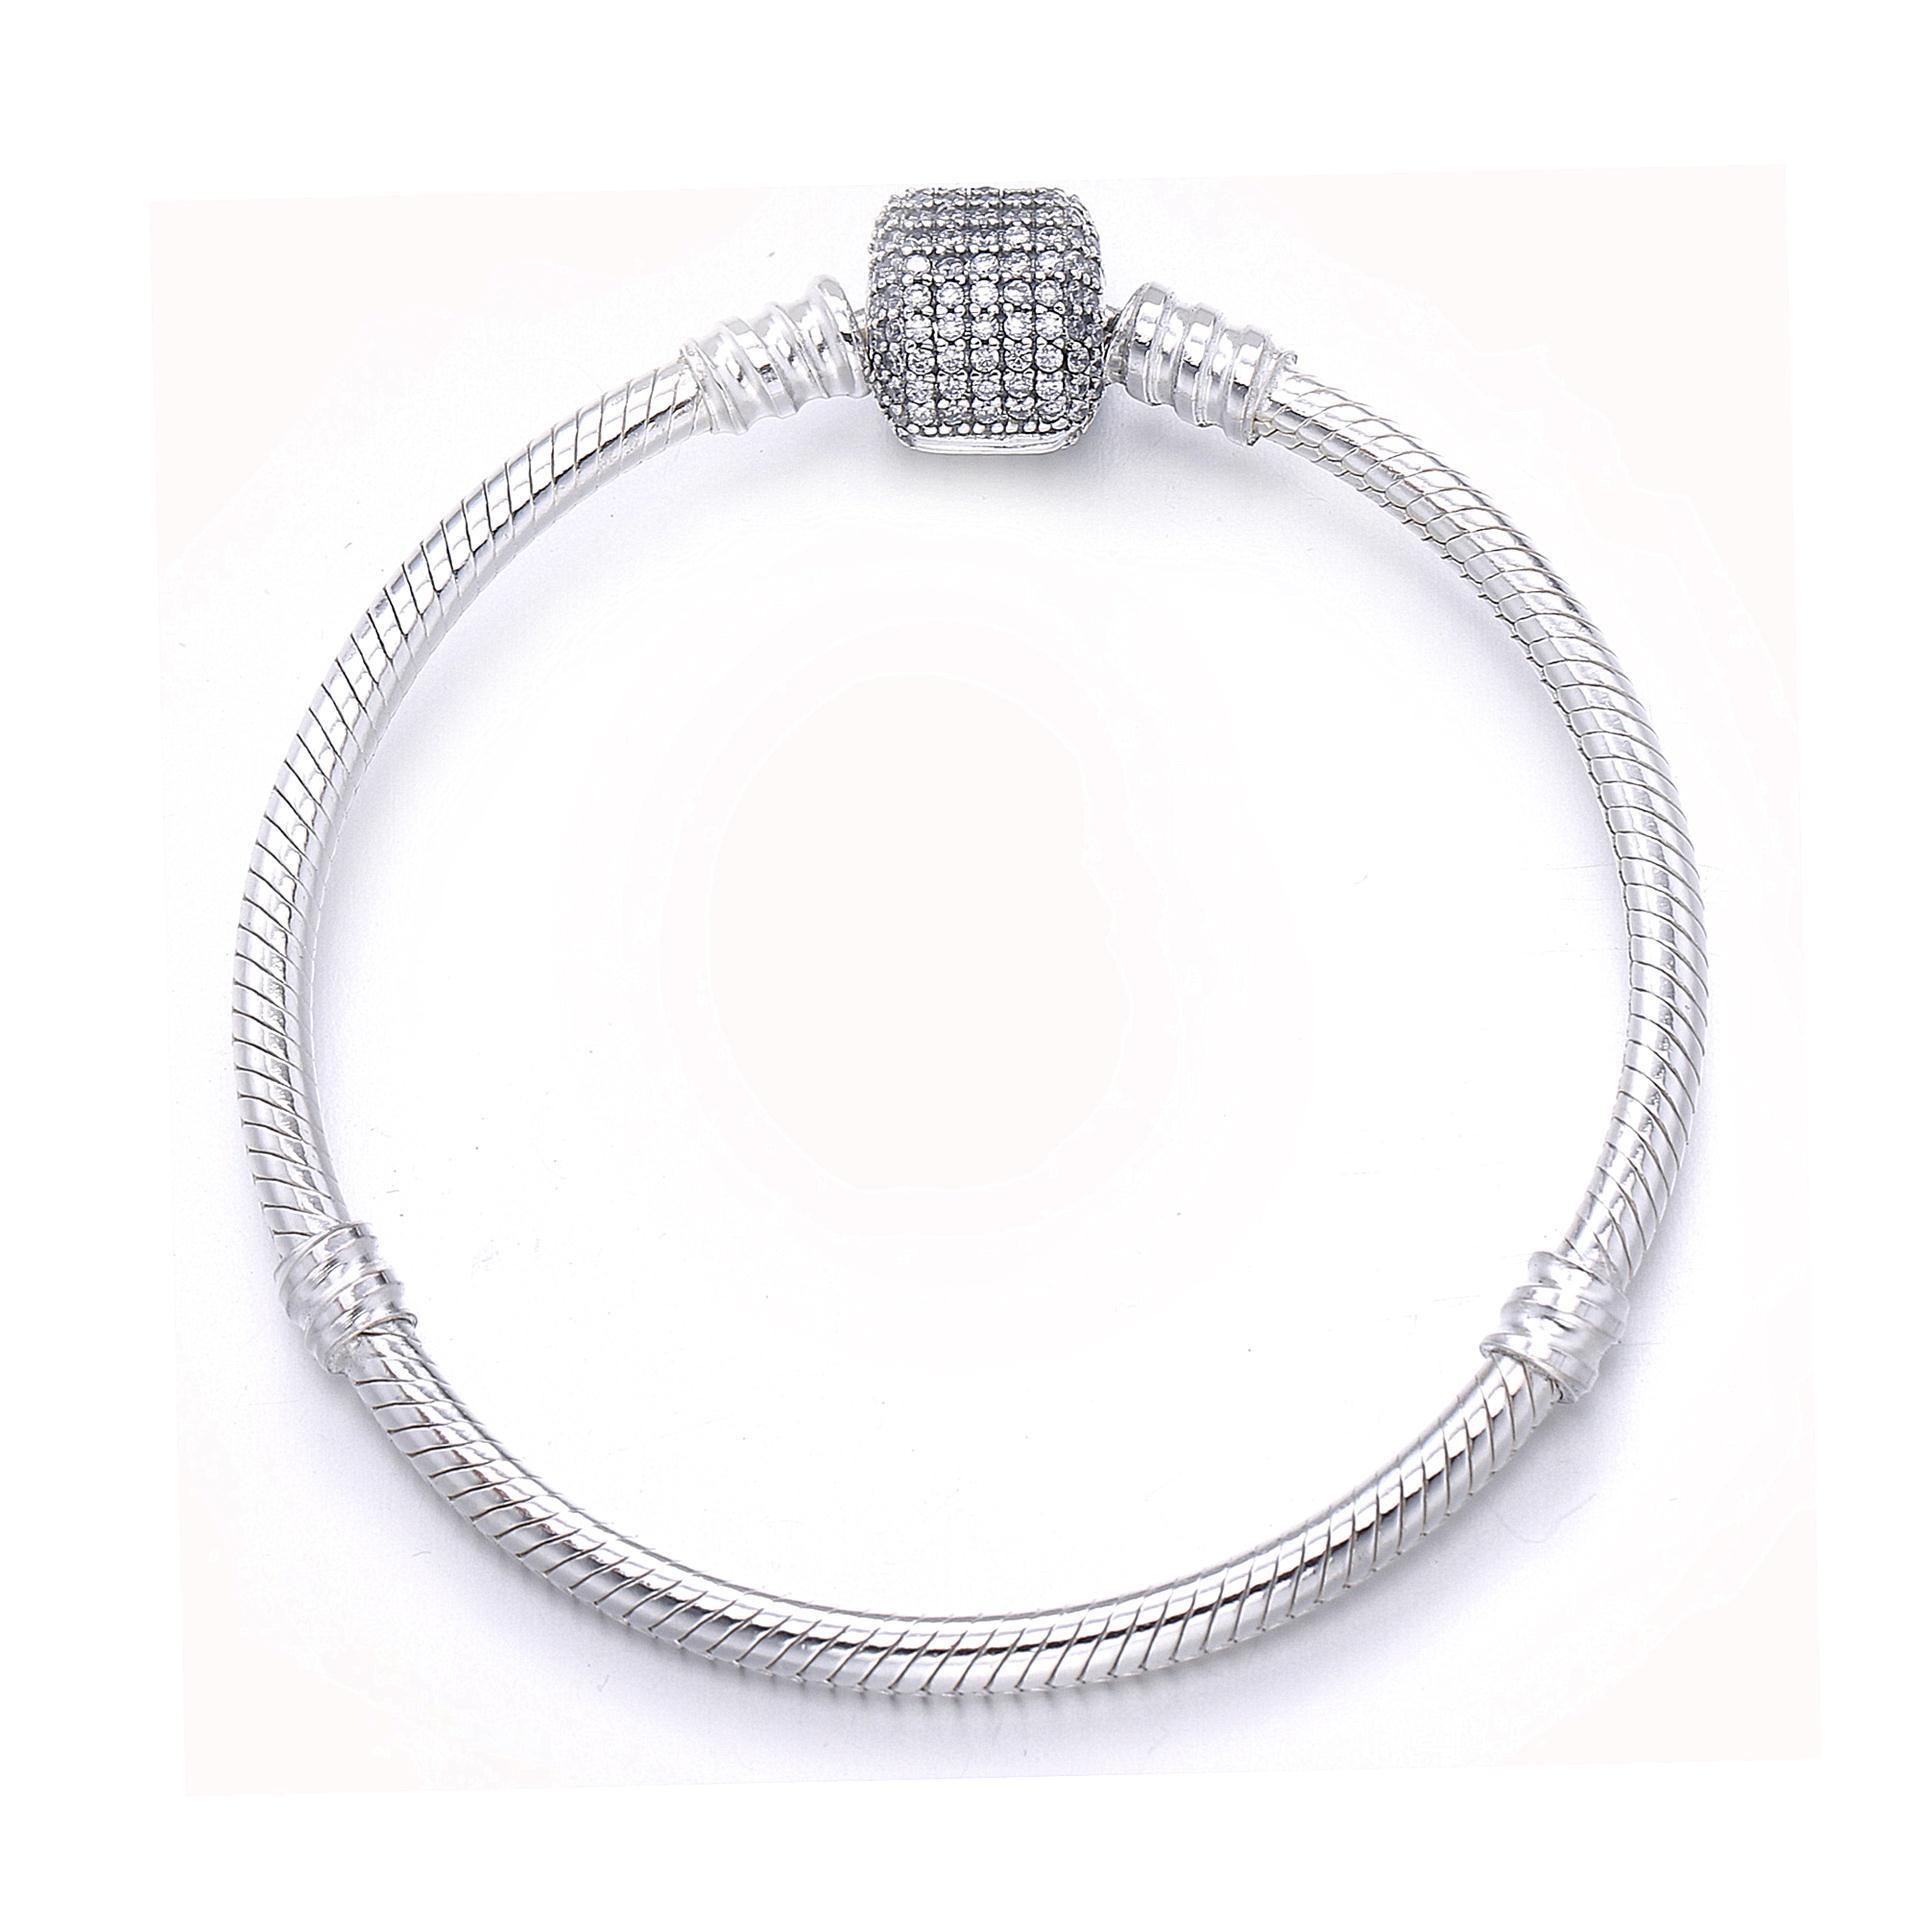 Luxury 100 925 Sterling Silver Bracelet Signature Clasp Crystal Snake Chain Bracelet Bangle Fit Women Bead